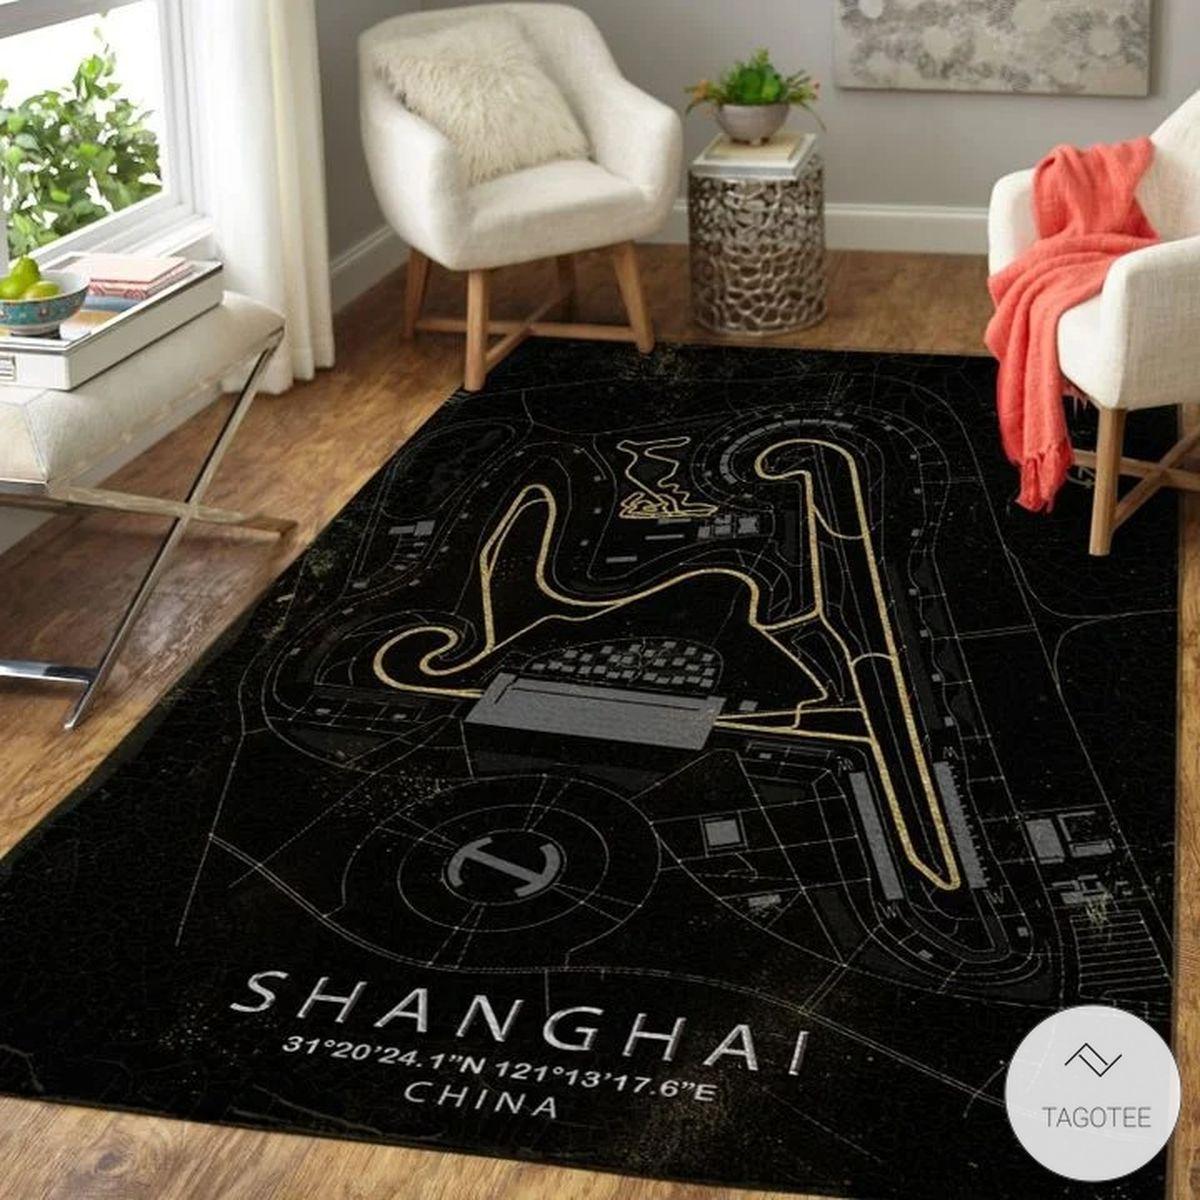 Shanghai China F1 Circuit Map Rugz